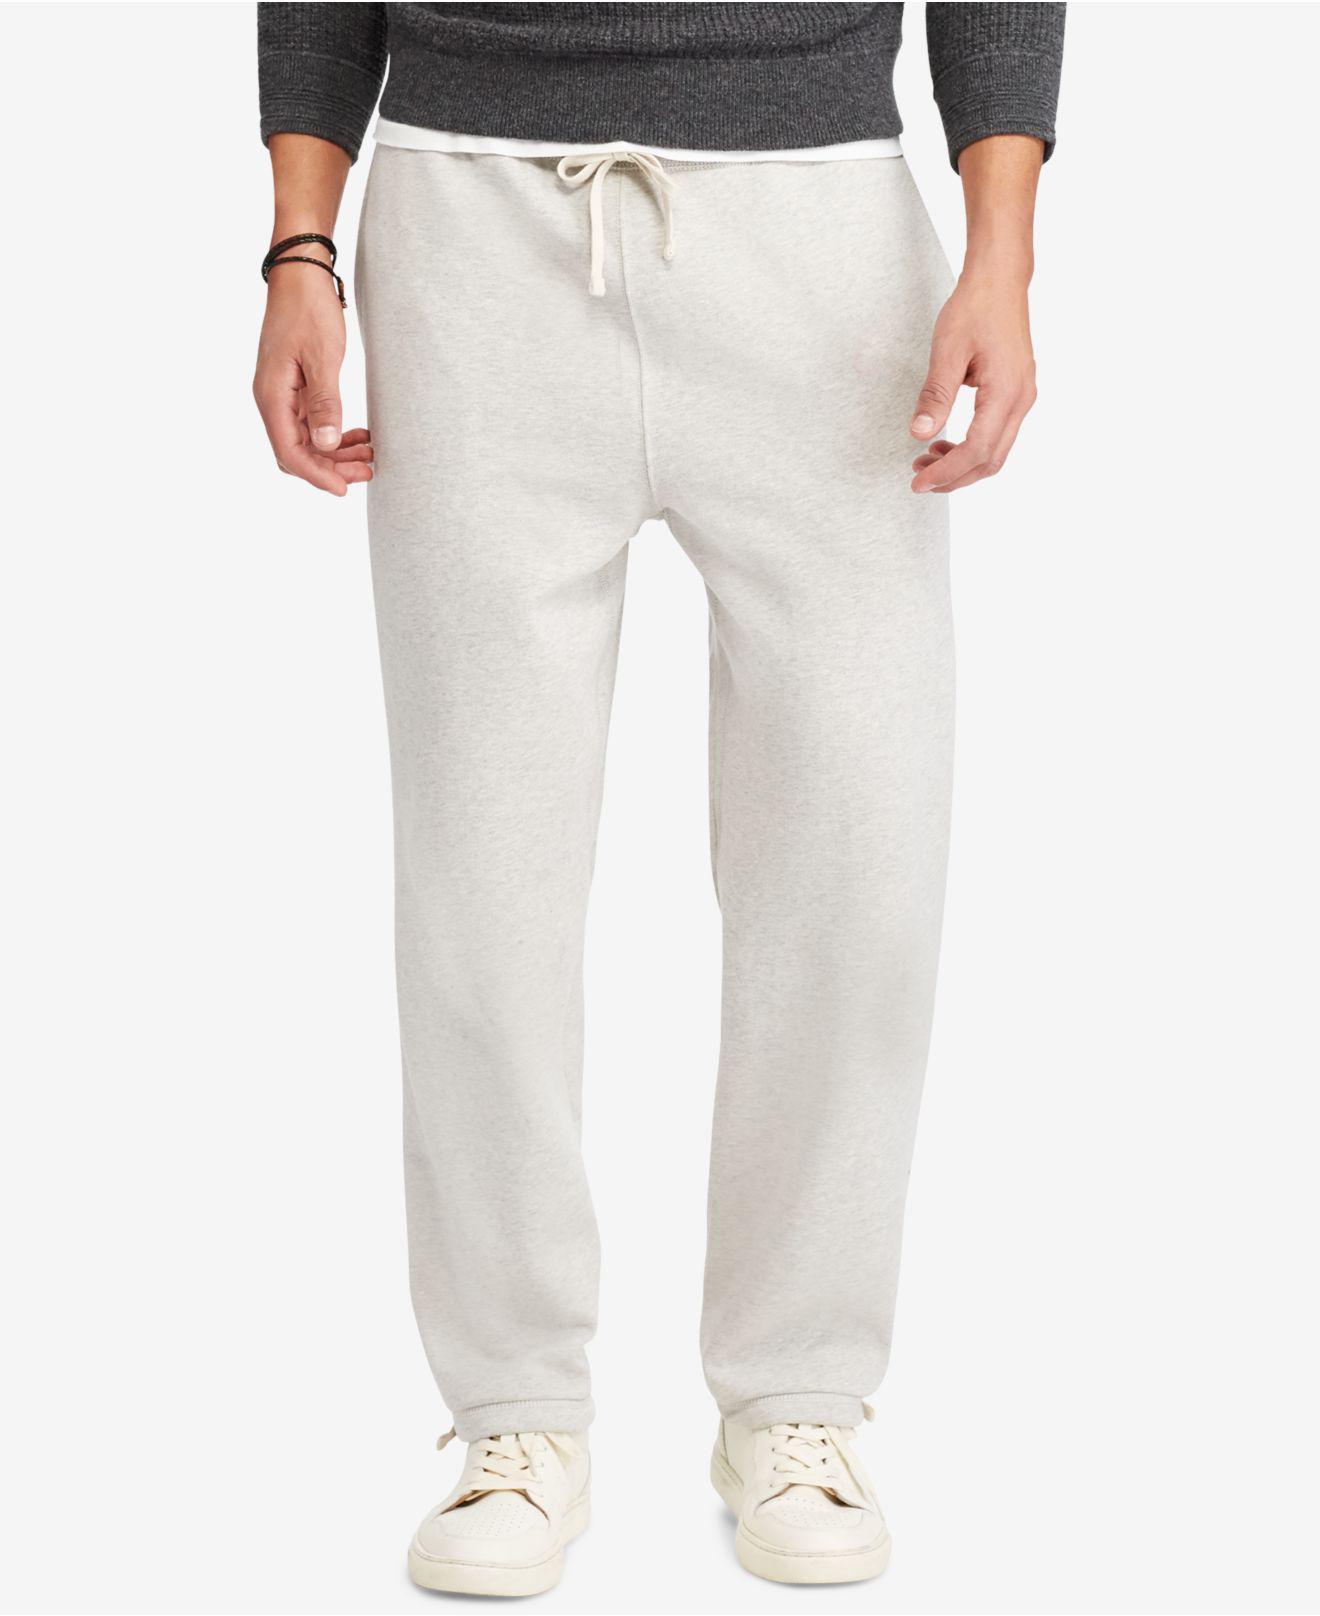 Lyst - Polo Ralph Lauren Fleece Pants in Natural for Men f33be1dfa